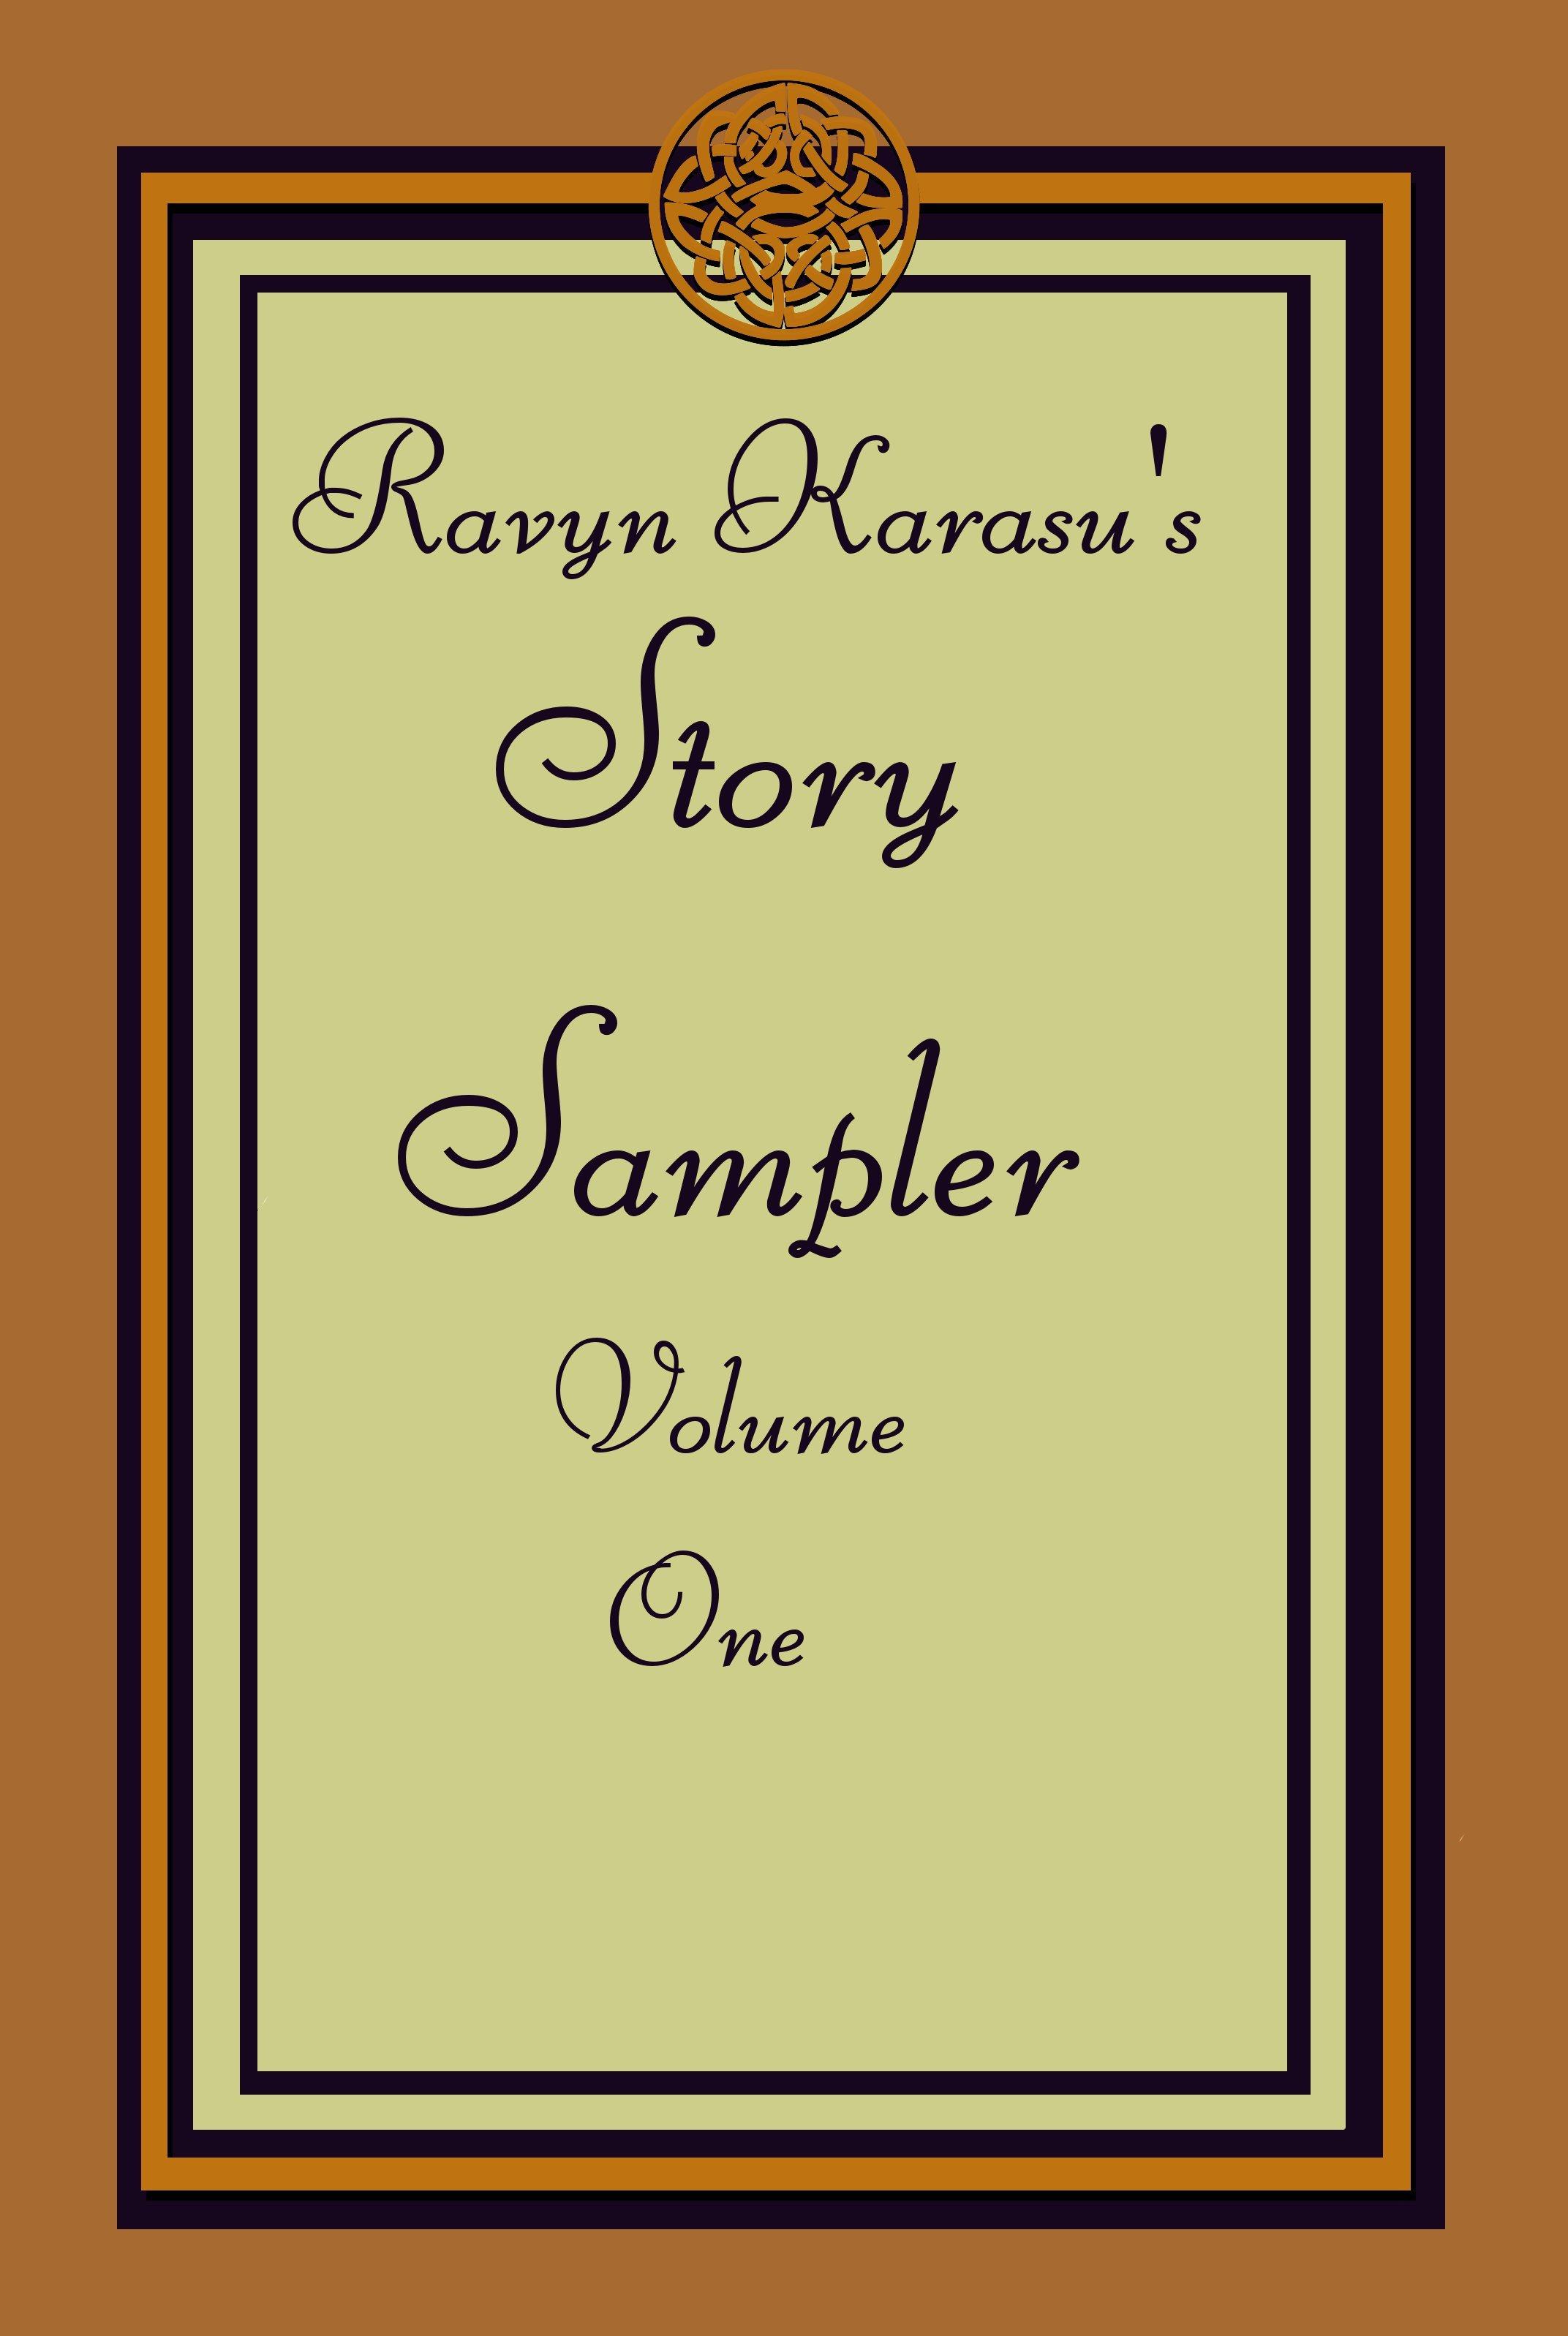 Ravyn Karasus Story Sampler: Volume One Ravyn Karasu